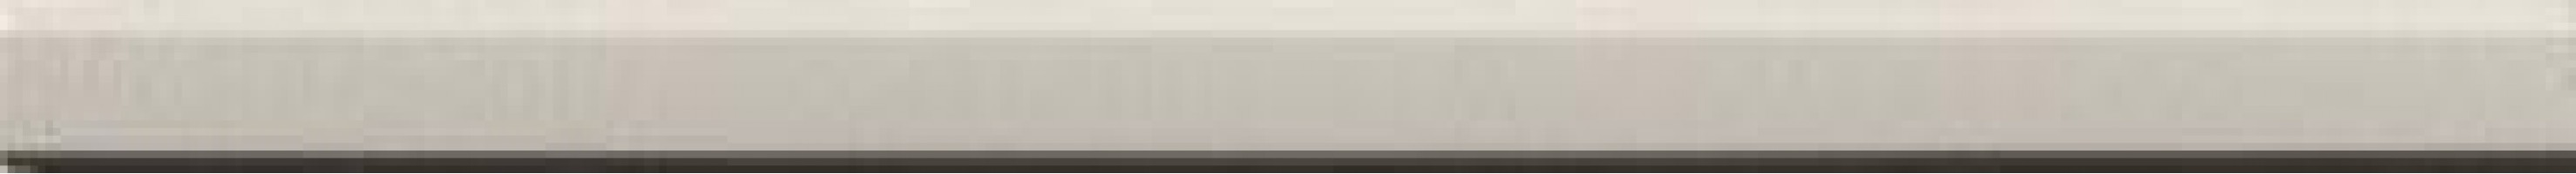 Бордюр B. Anthea 2A 2x30 Imola Ceramica